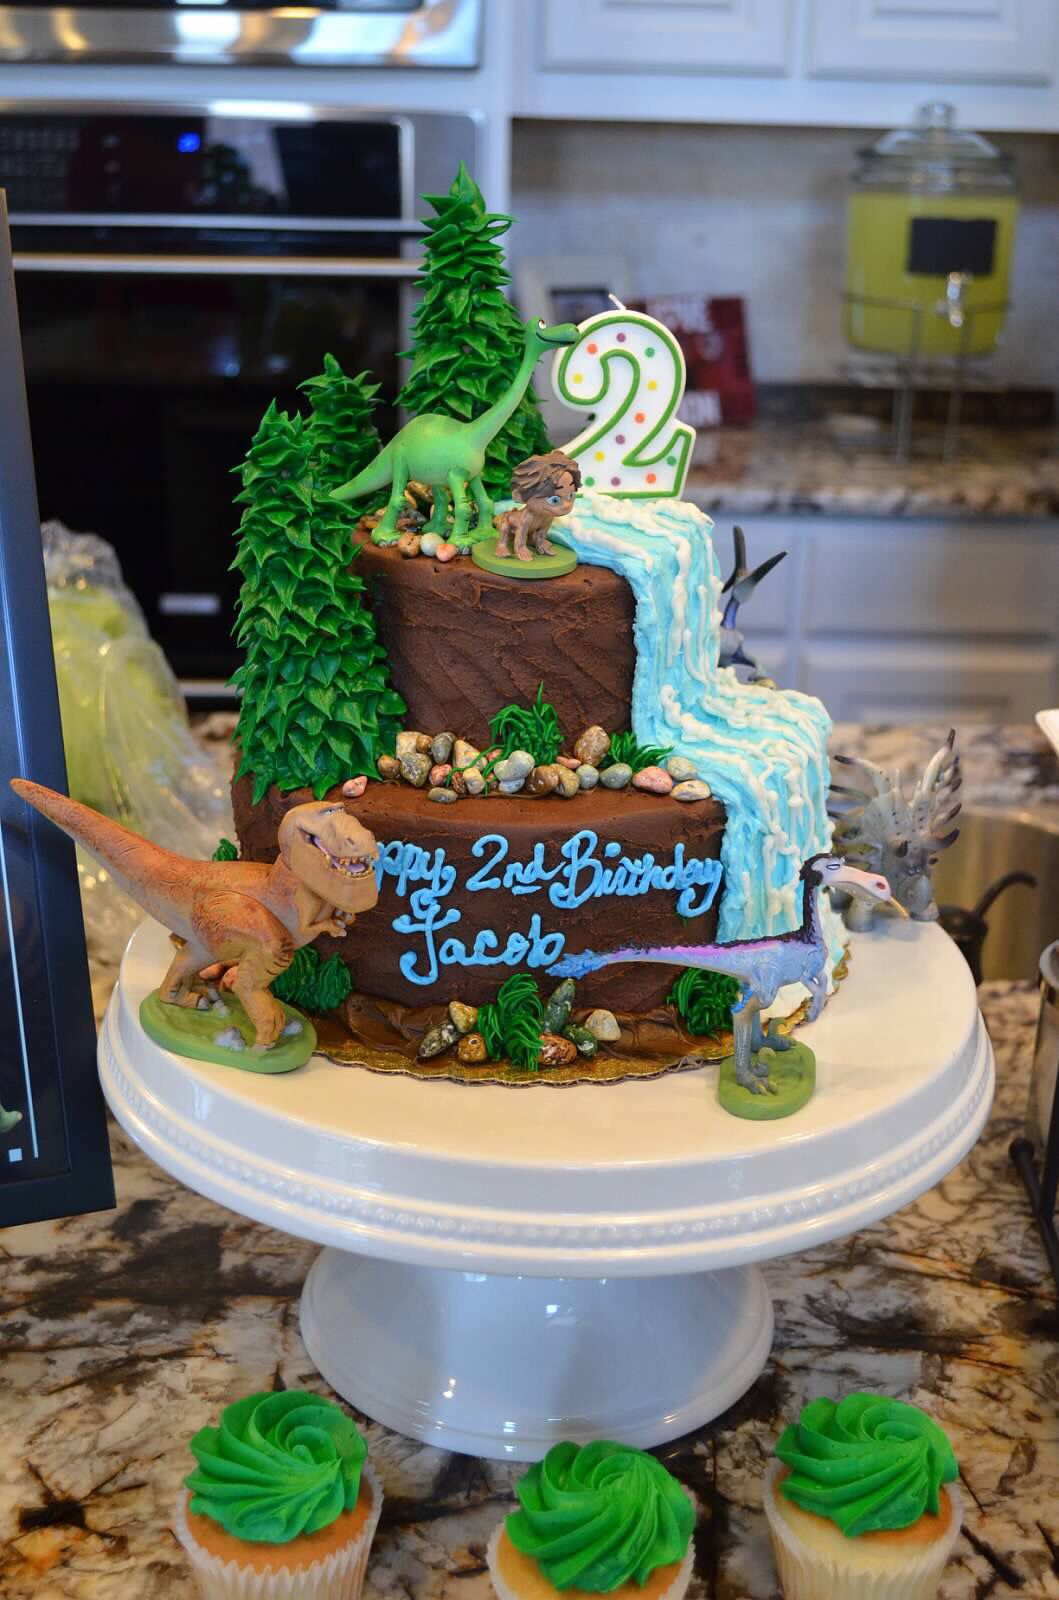 The Good Dinosaur birthday cake making it through the wilderness